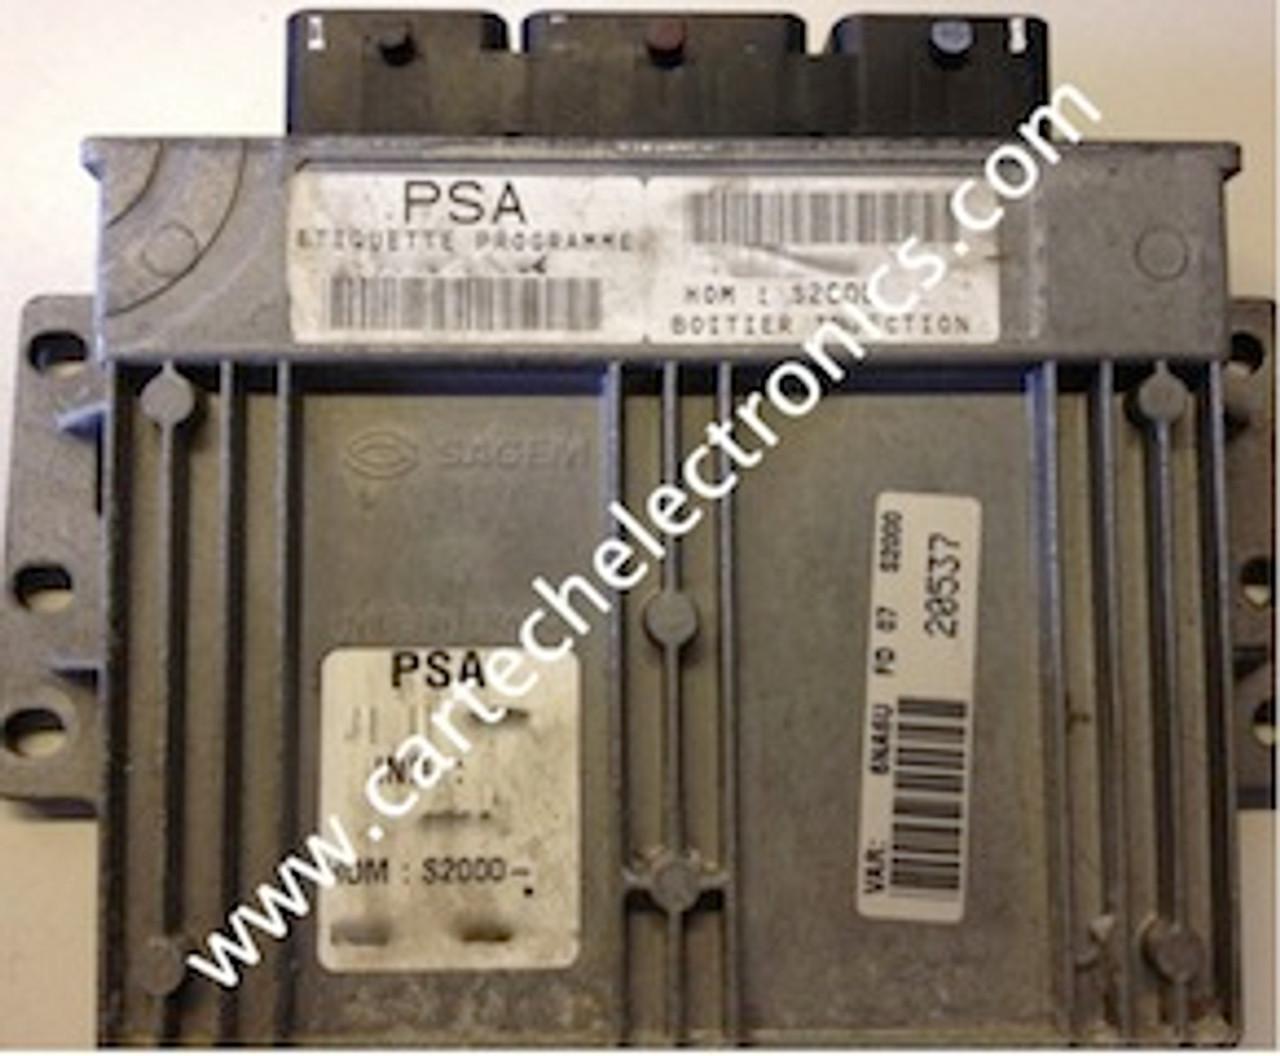 Plug & Play Engine ECU PSA S2000-1 9644486380 9643786680-01 21646328-9